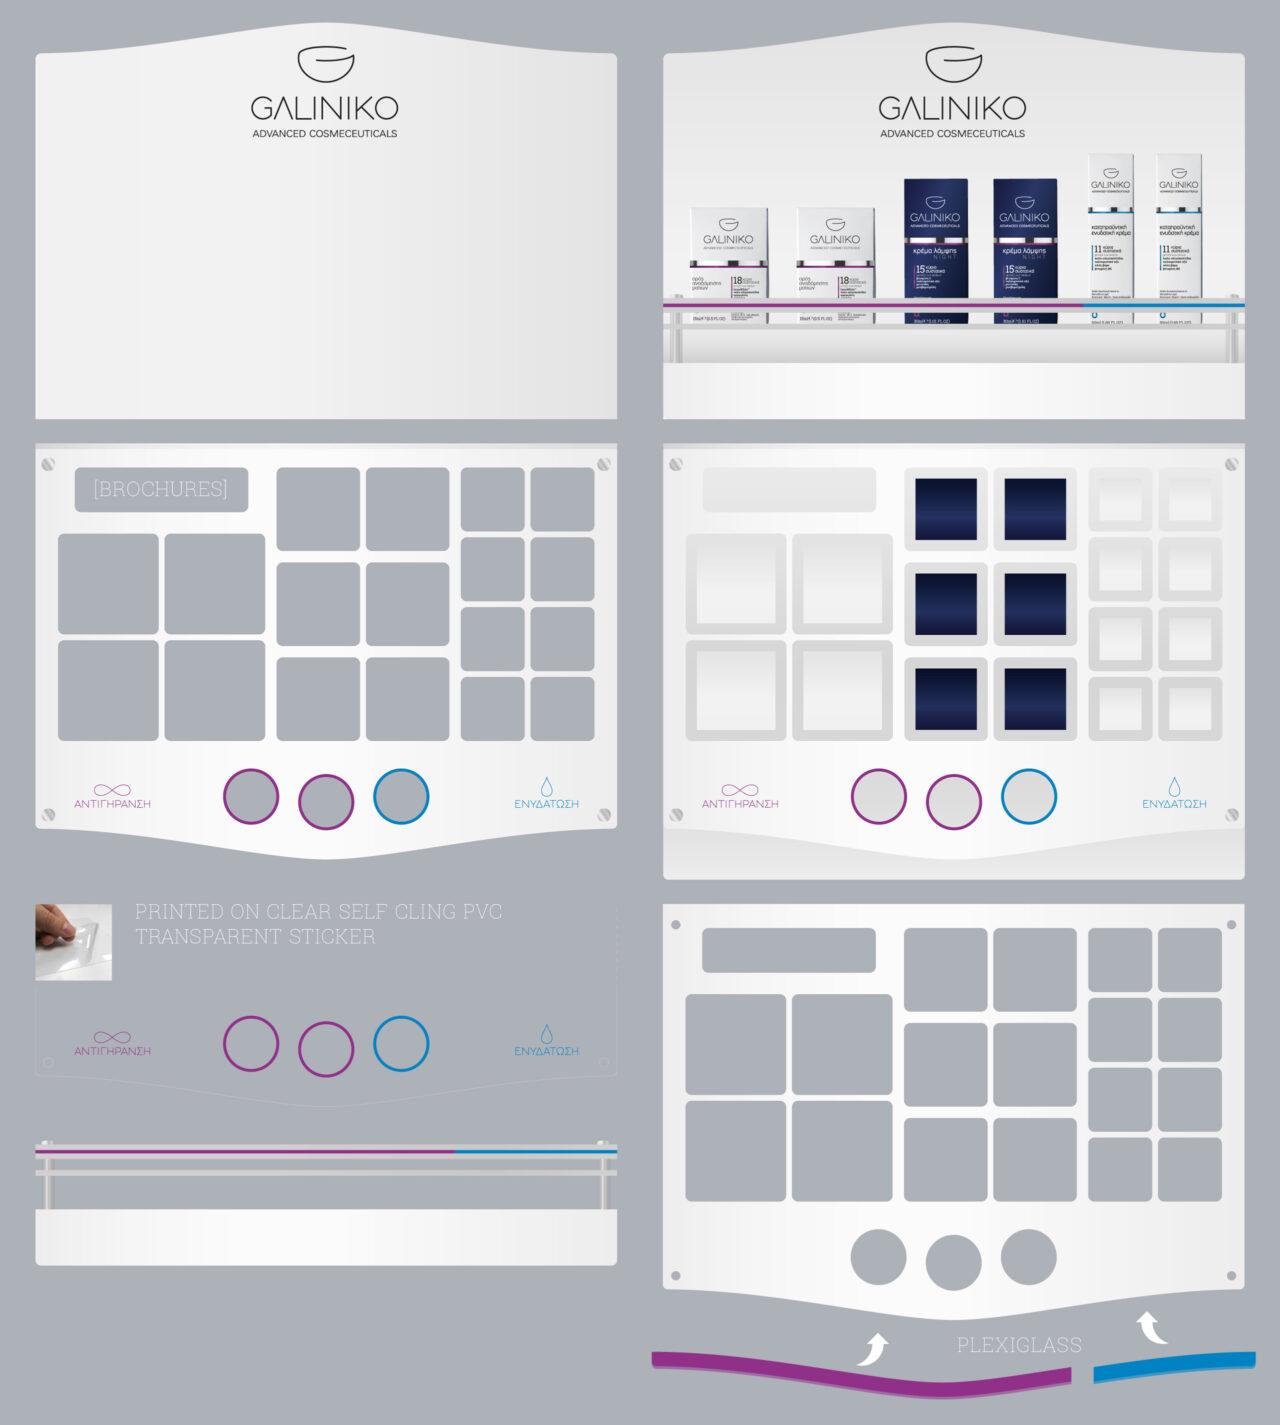 Galiniko retail pharmacies acrylic display stand design